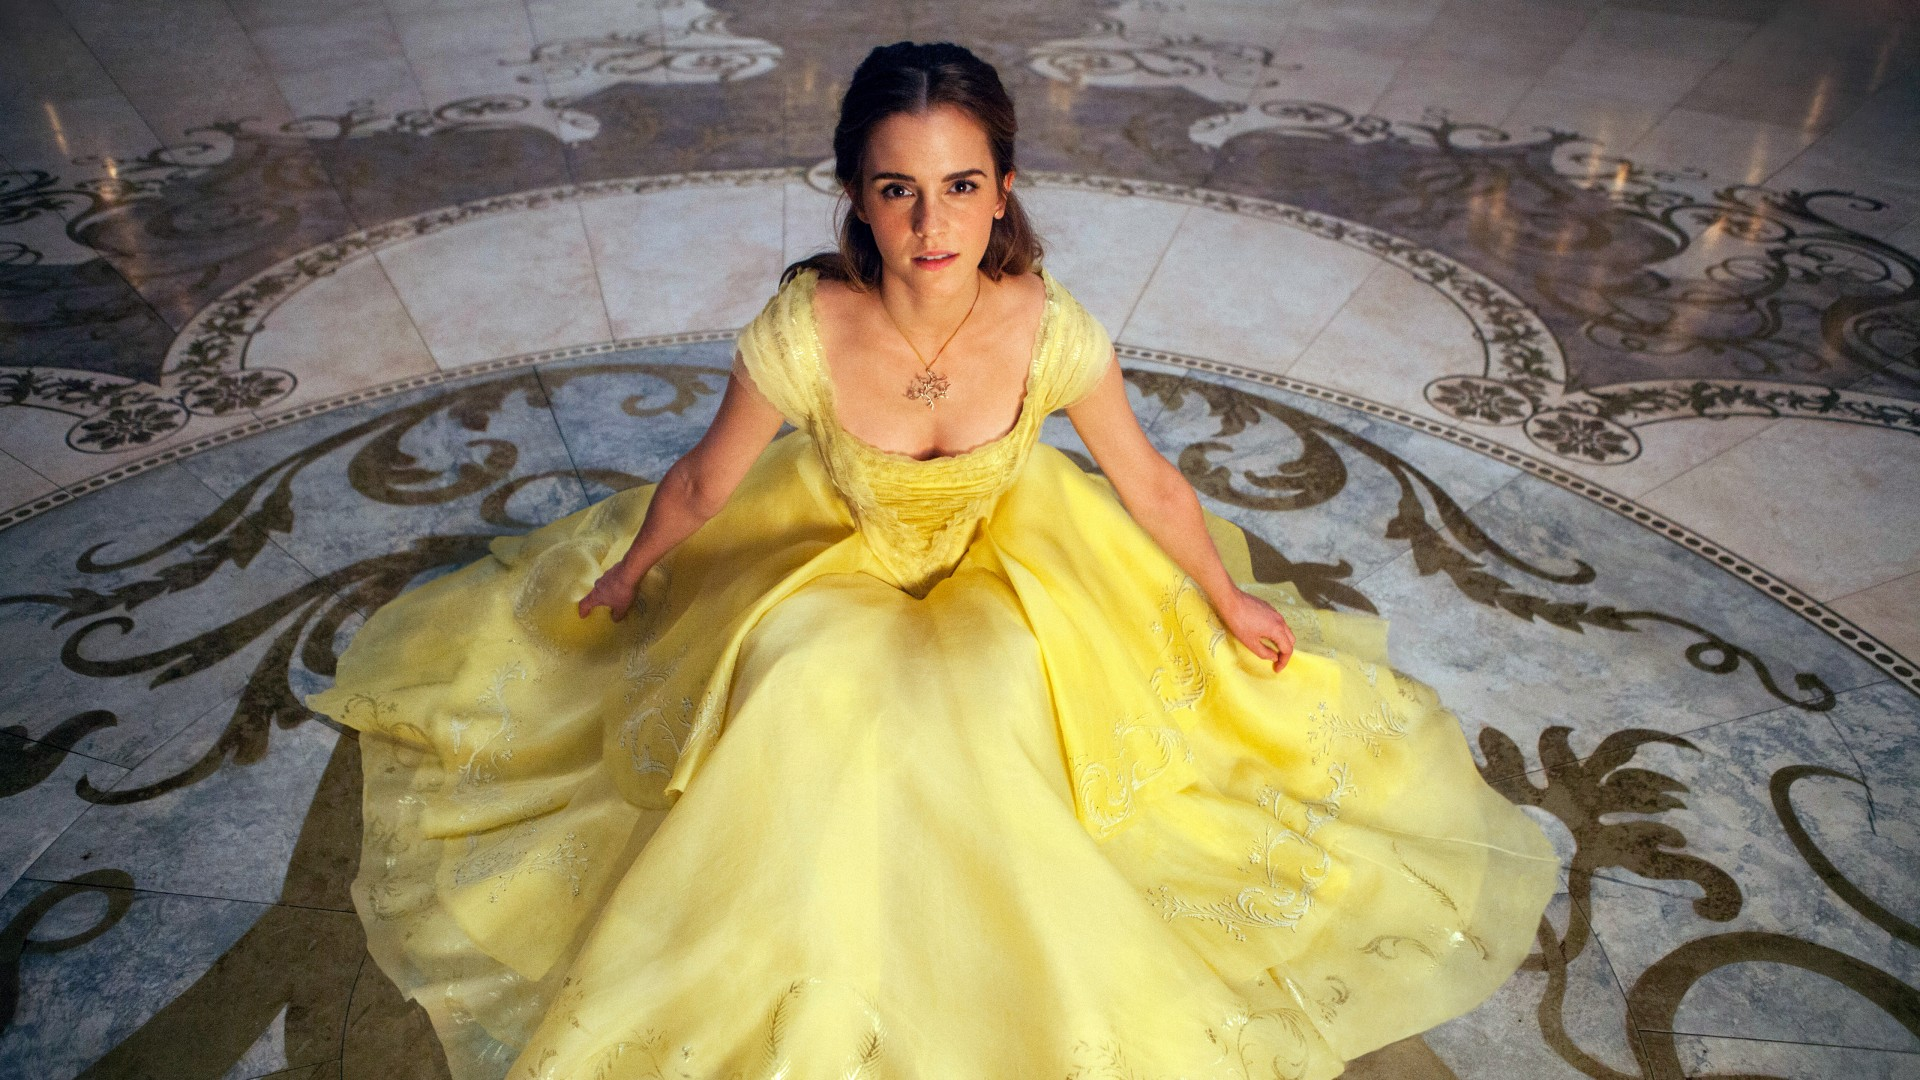 Hd Wallpaper Iphone X Emma Watson Belle Beauty And The Beast Wallpapers Hd